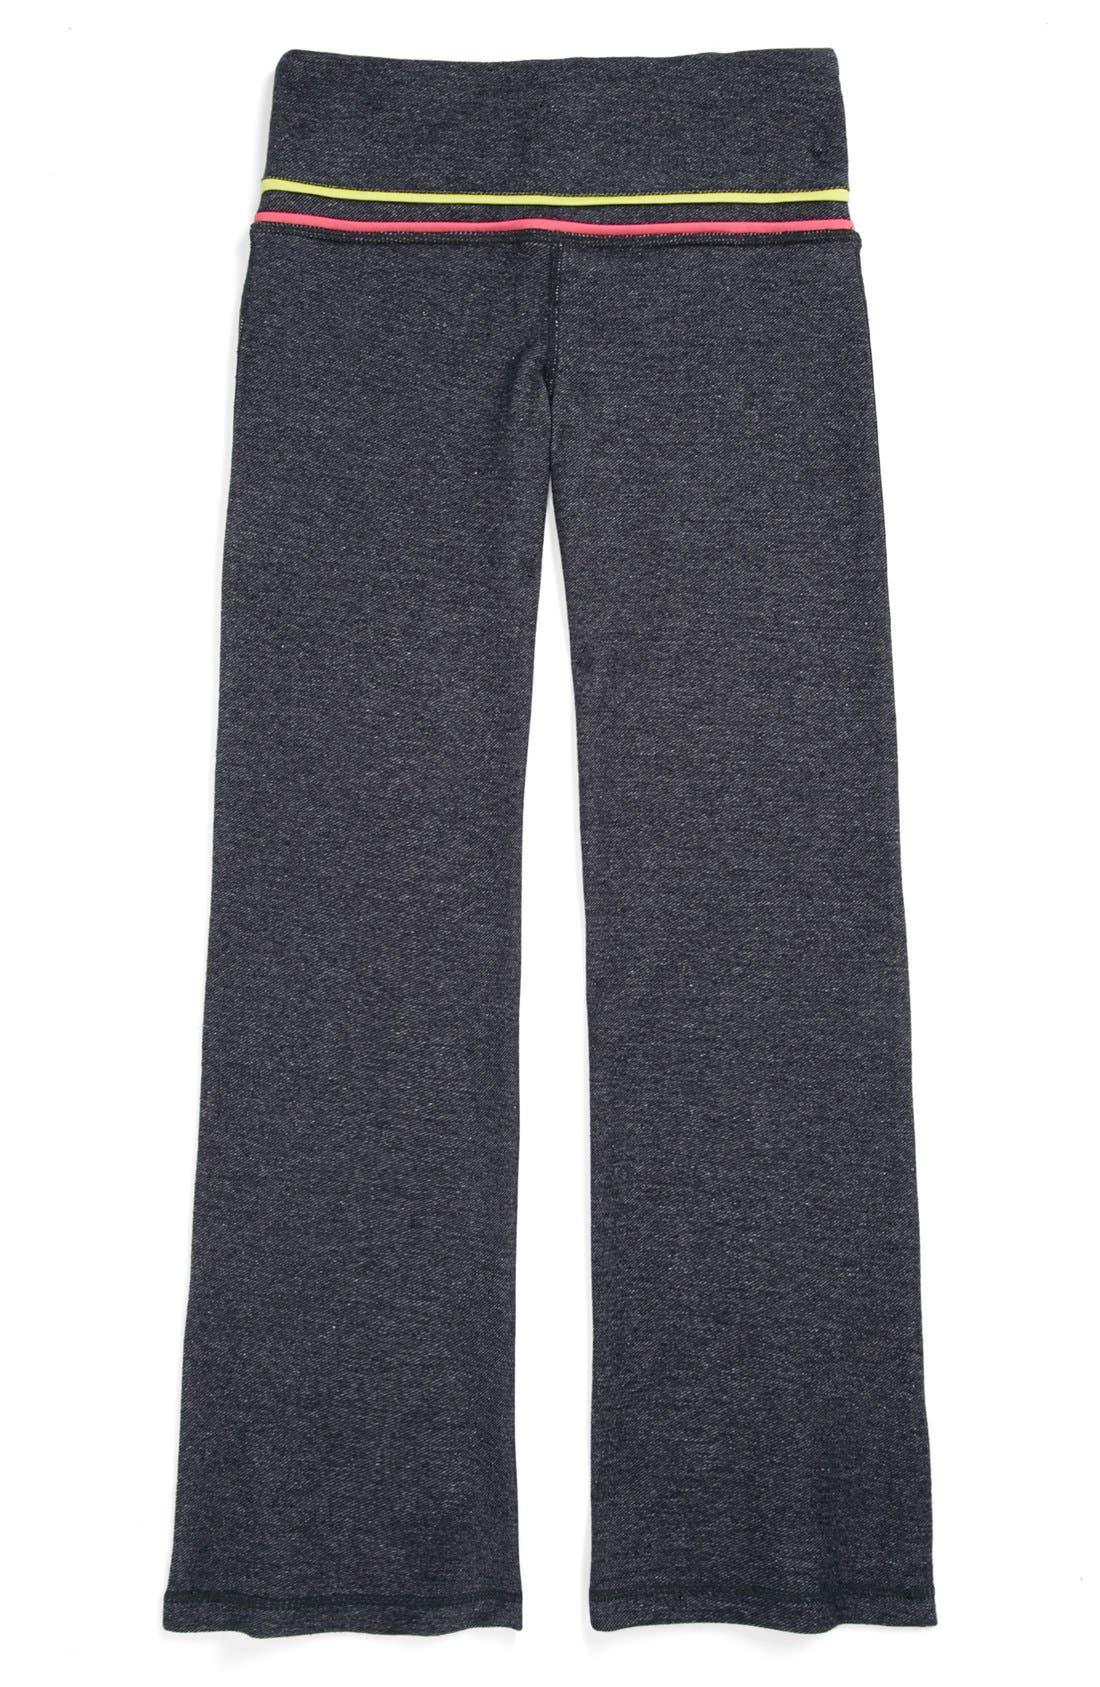 Main Image - Limeapple 'Asana' Pants (Big Girls)